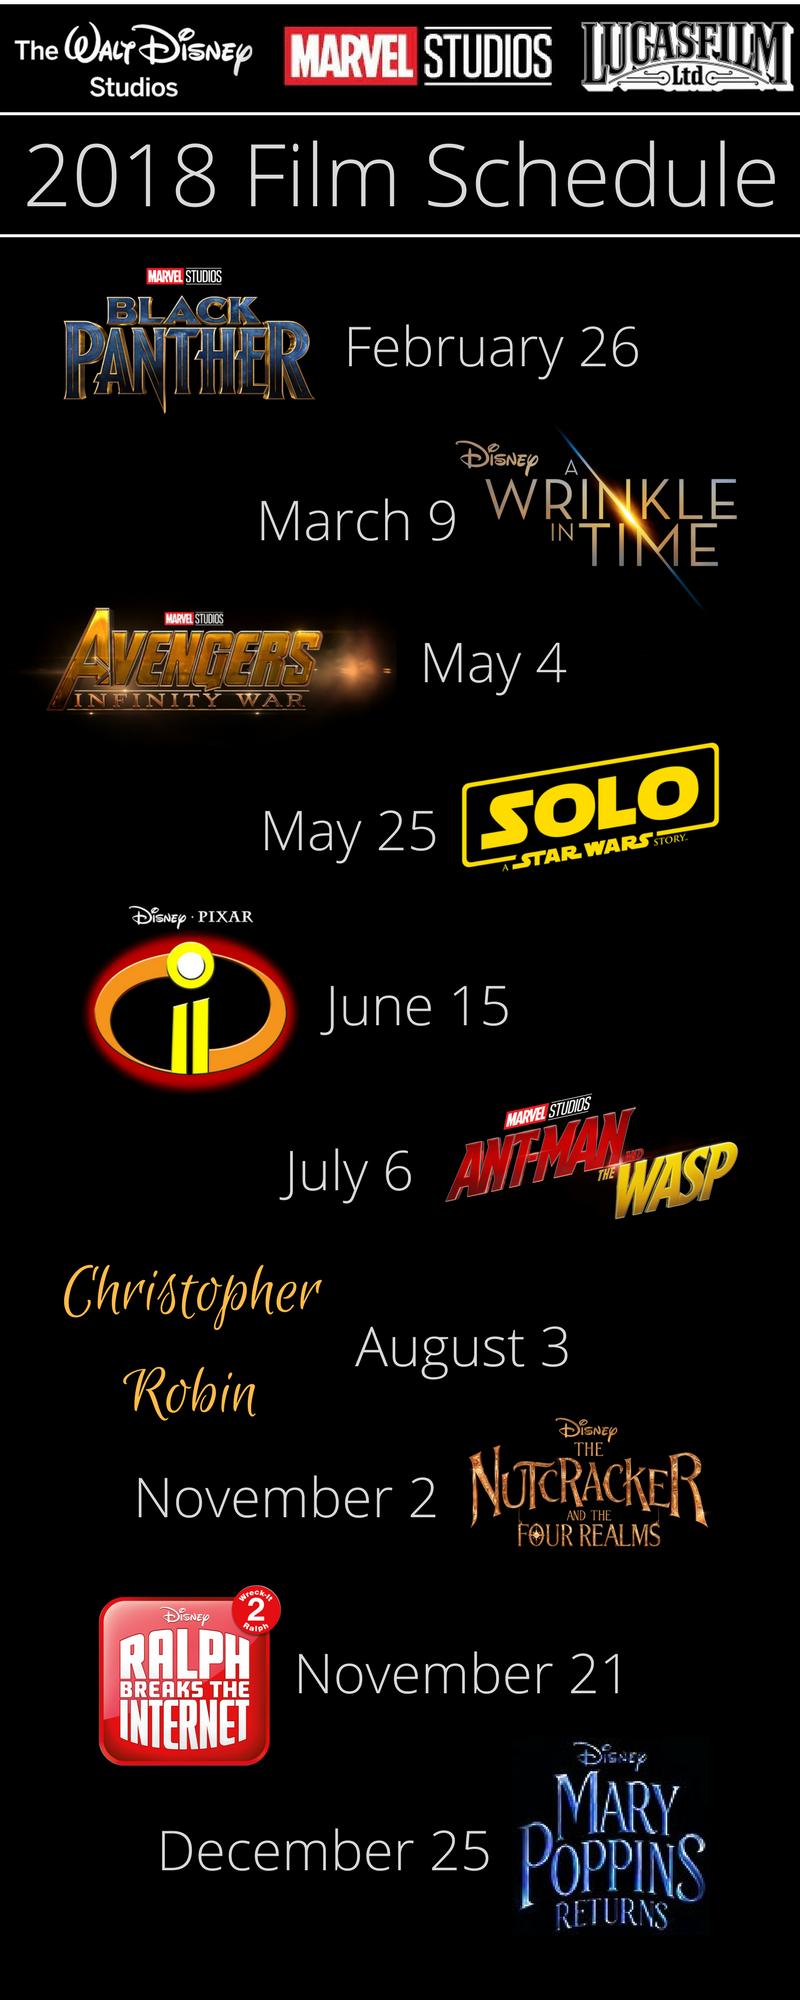 Get The Full Film Schedule Of Films Coming From Walt Disney Studios Marvel Studios And Lucasfilm In 2018 Disney Studios Walt Disney Studios Walt Disney